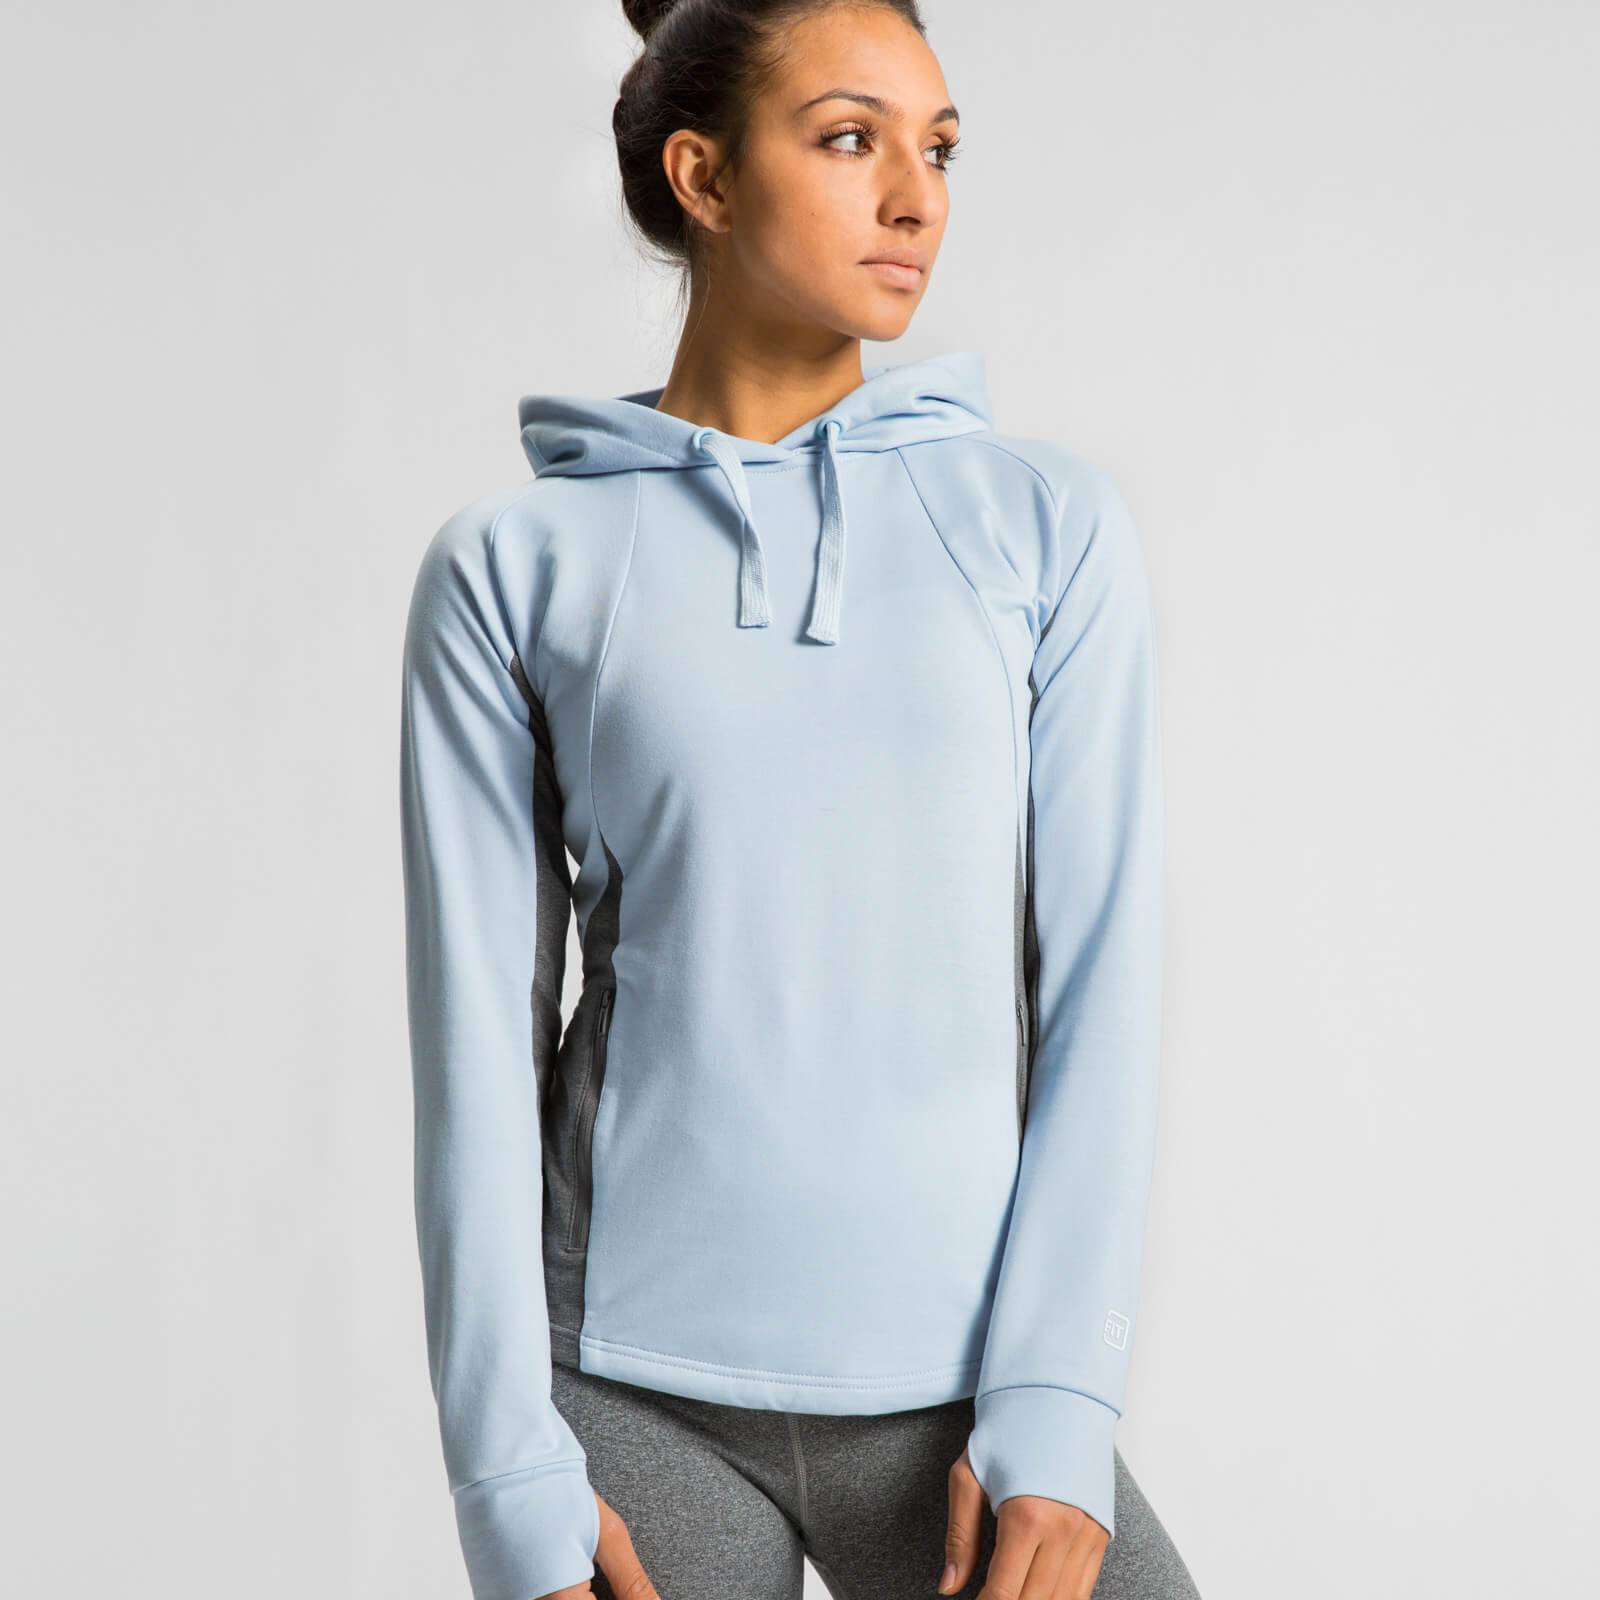 IdealFit Superlite Pullover Hoodie - Light Blue - XS - Blue